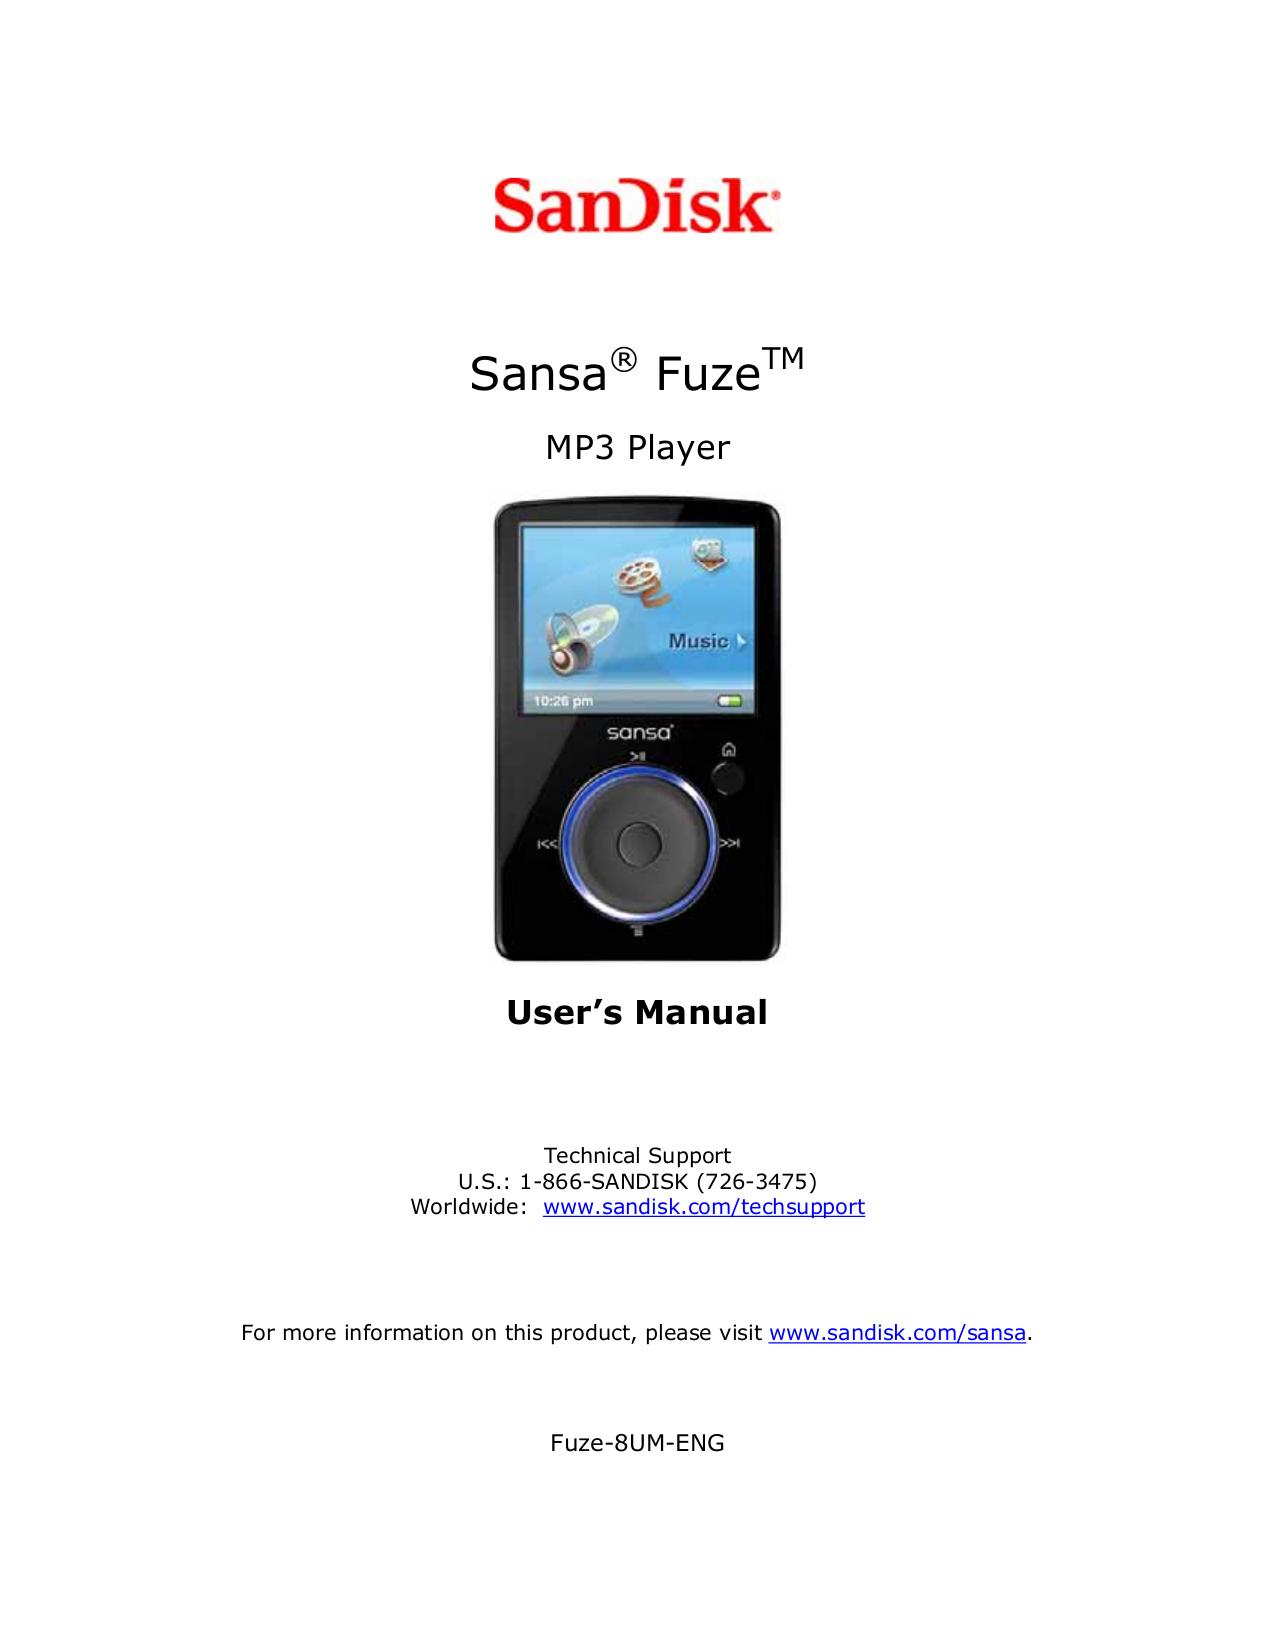 download free pdf for sandisk sansa sansa fuze 2gb mp3 player manual rh umlib com sandisk sansa c250 2gb mp3 player manual SanDisk MP3 Player Instructions